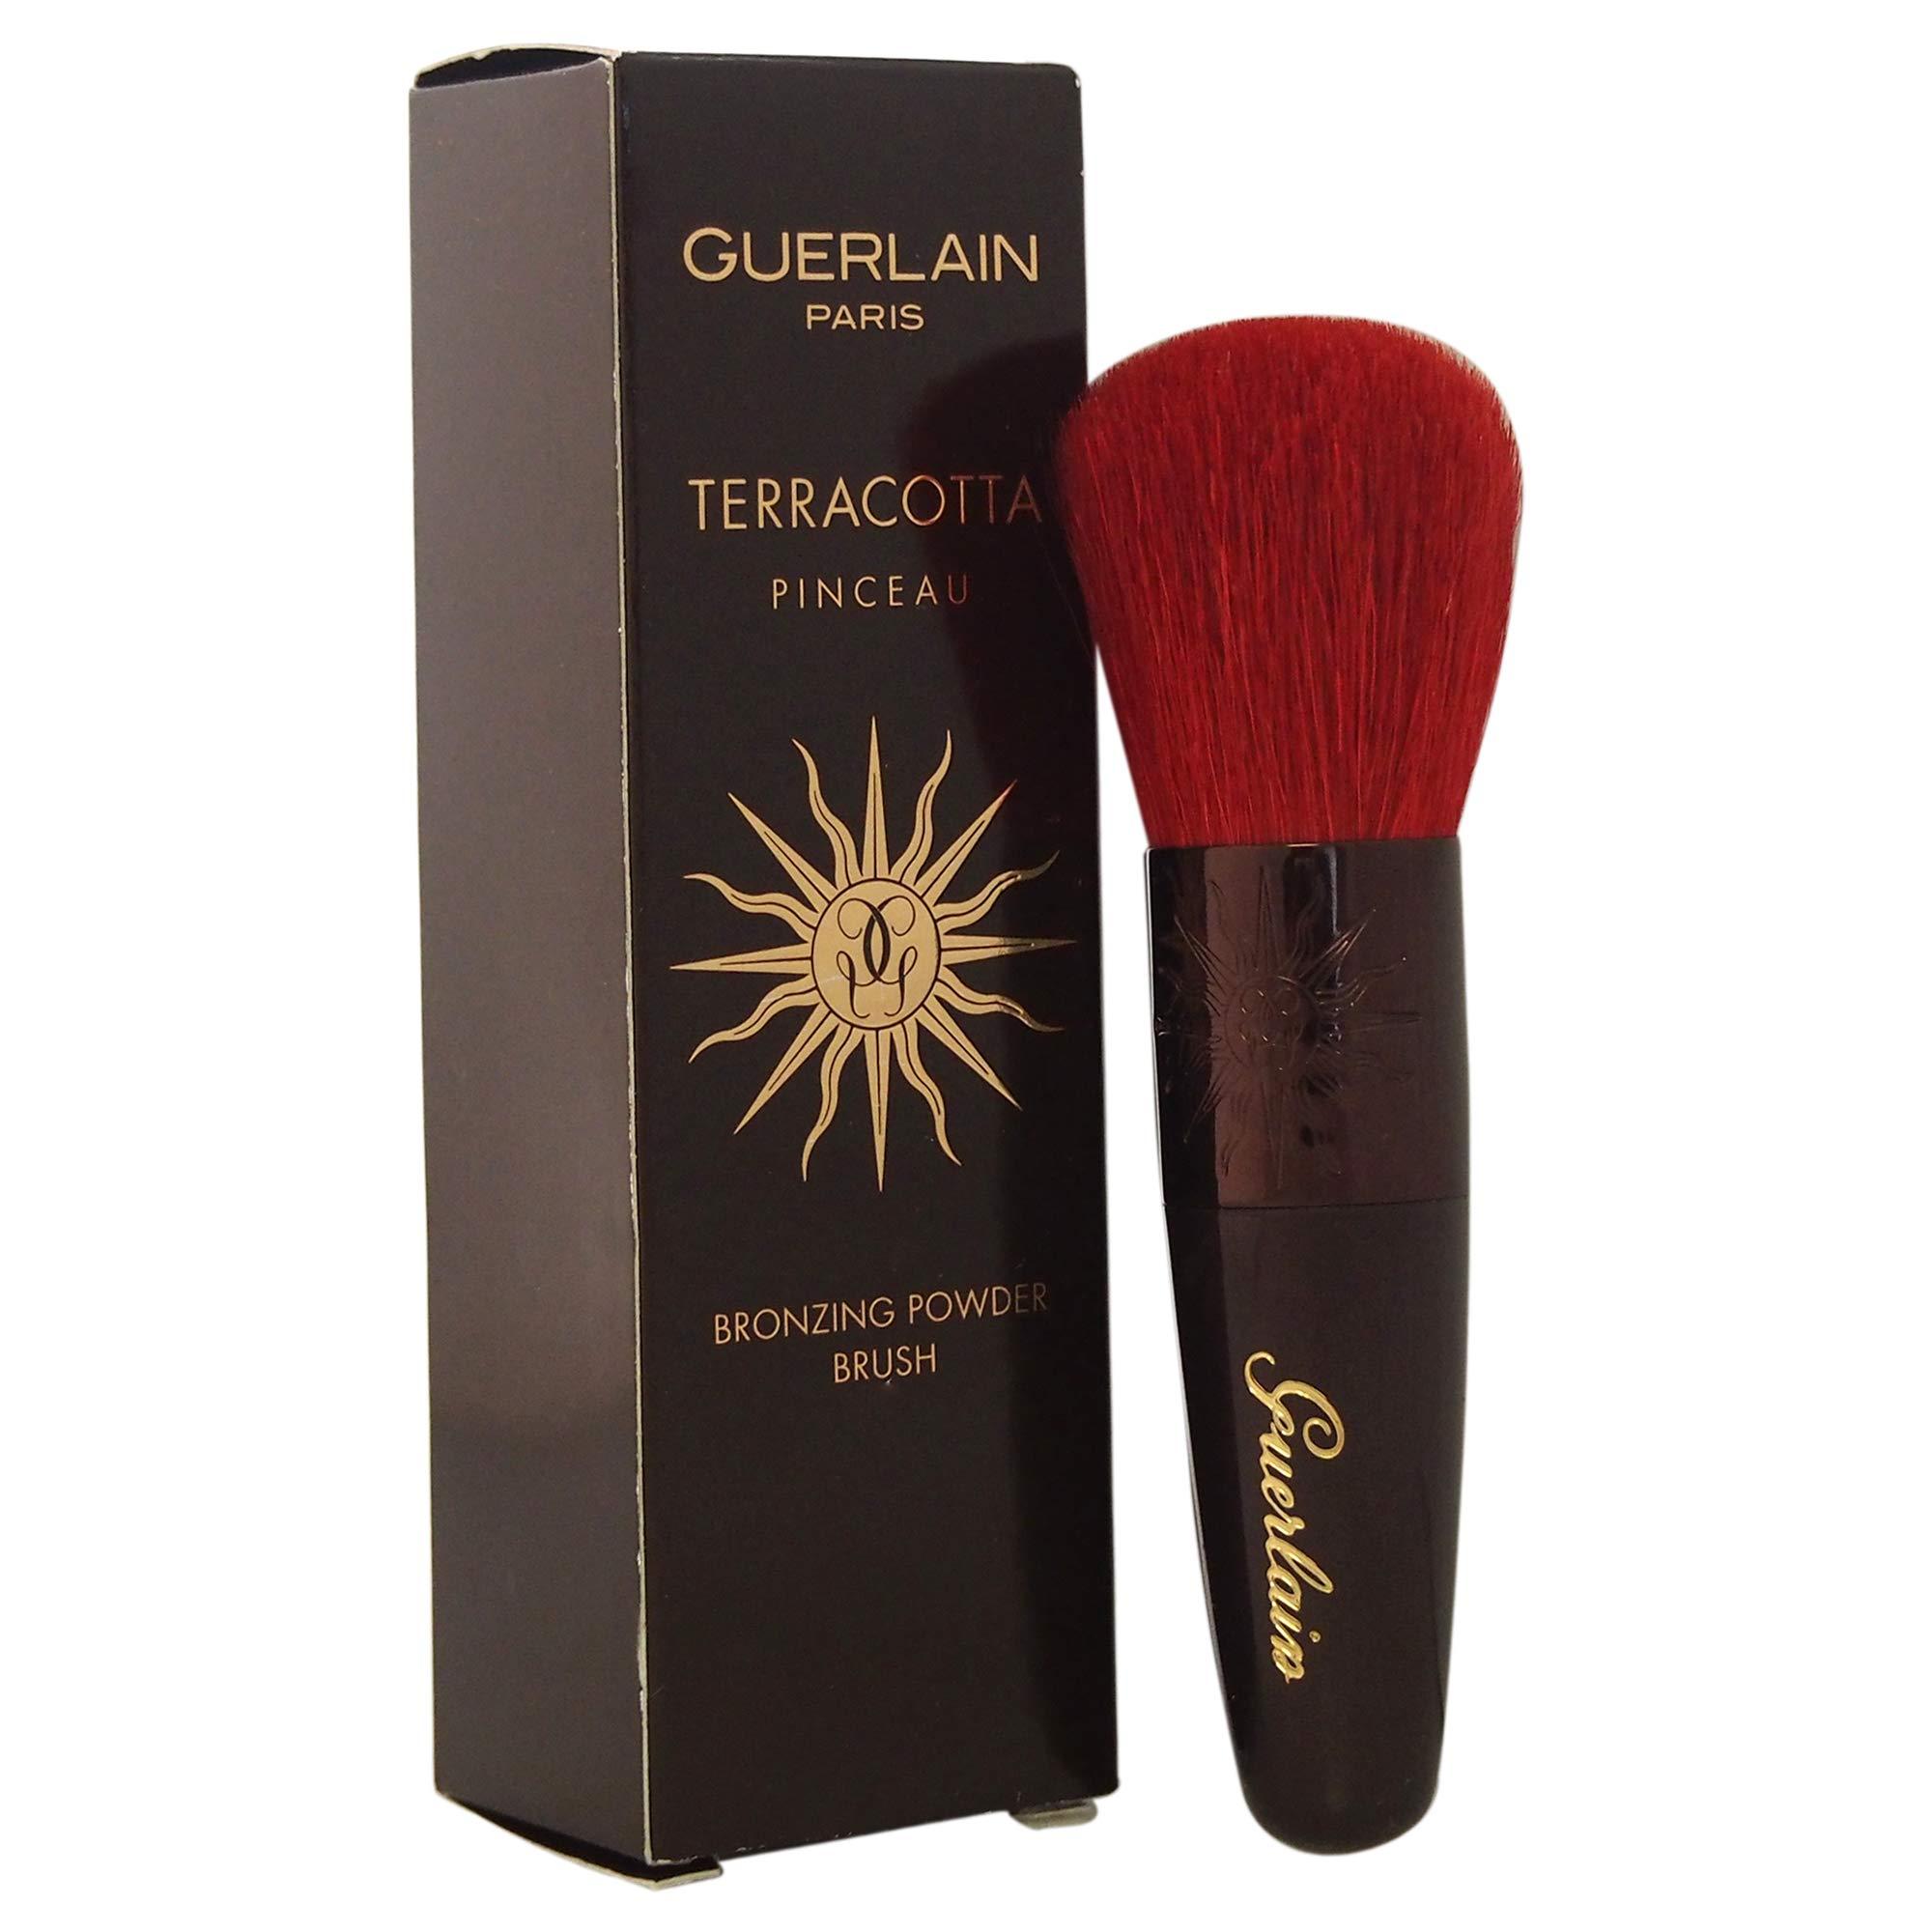 Guerlain Terracotta Pinceau Bronzing Powder Brush